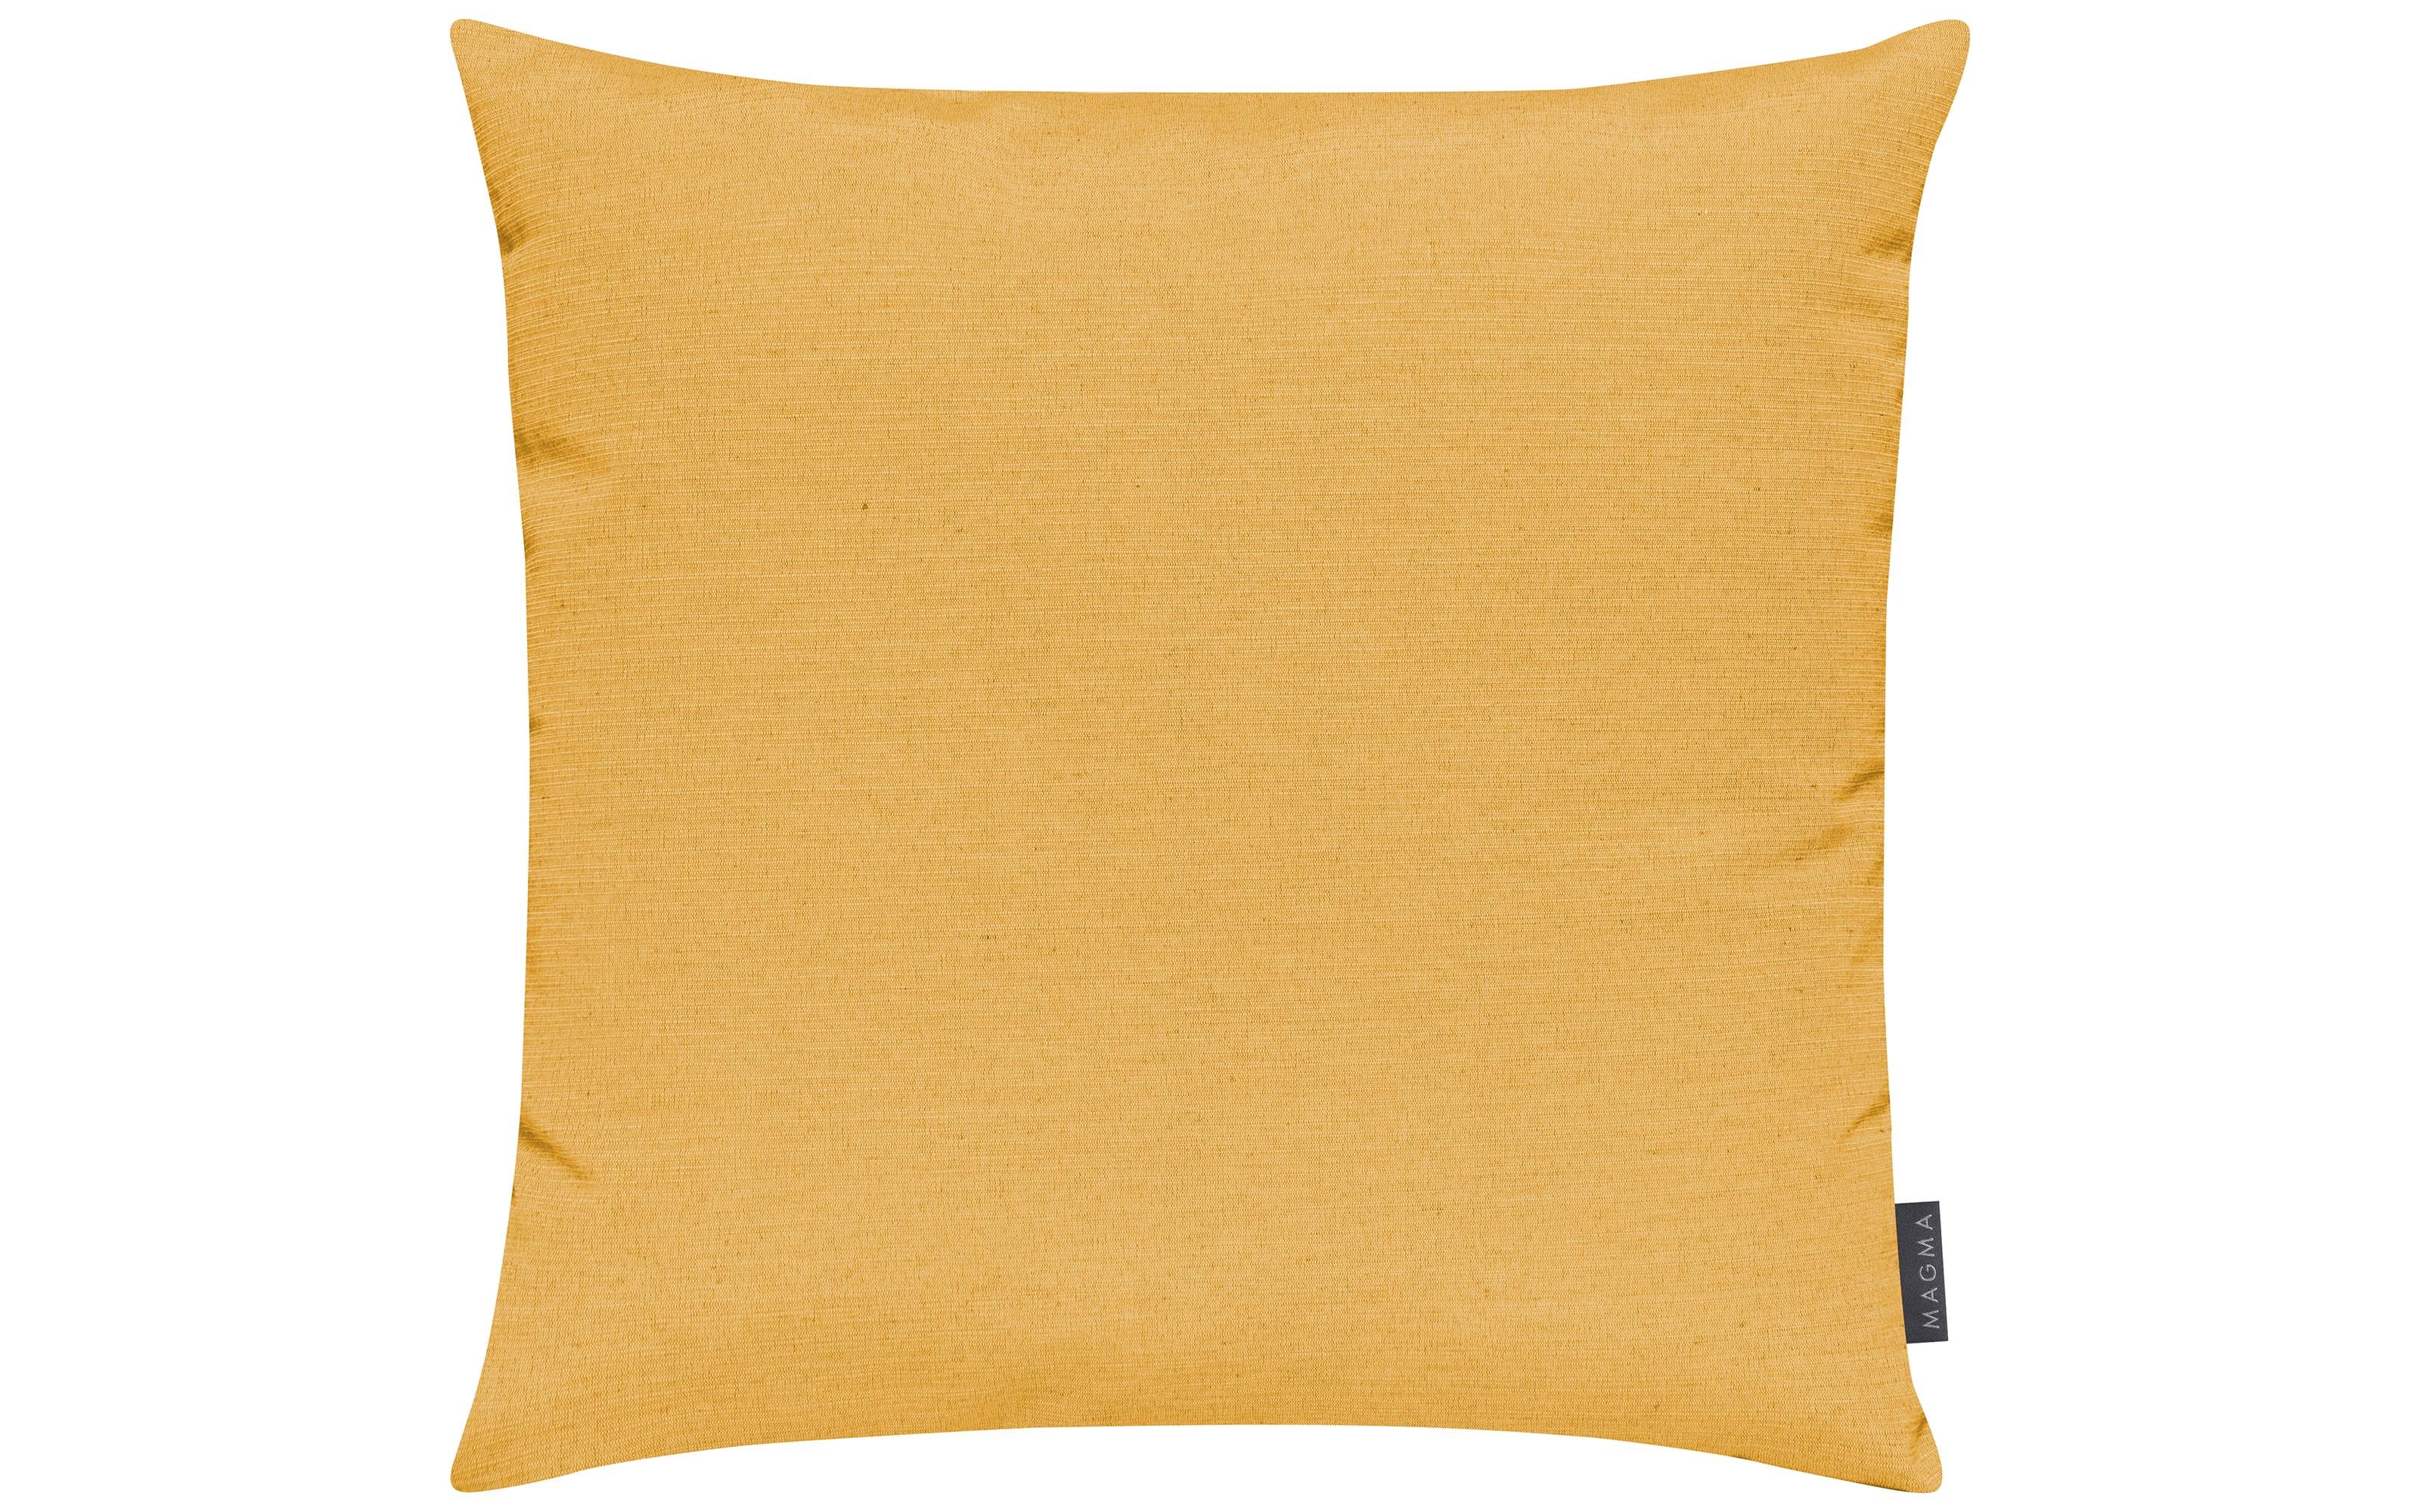 Kissenhülle Fino in gelb, 50 x 50 cm